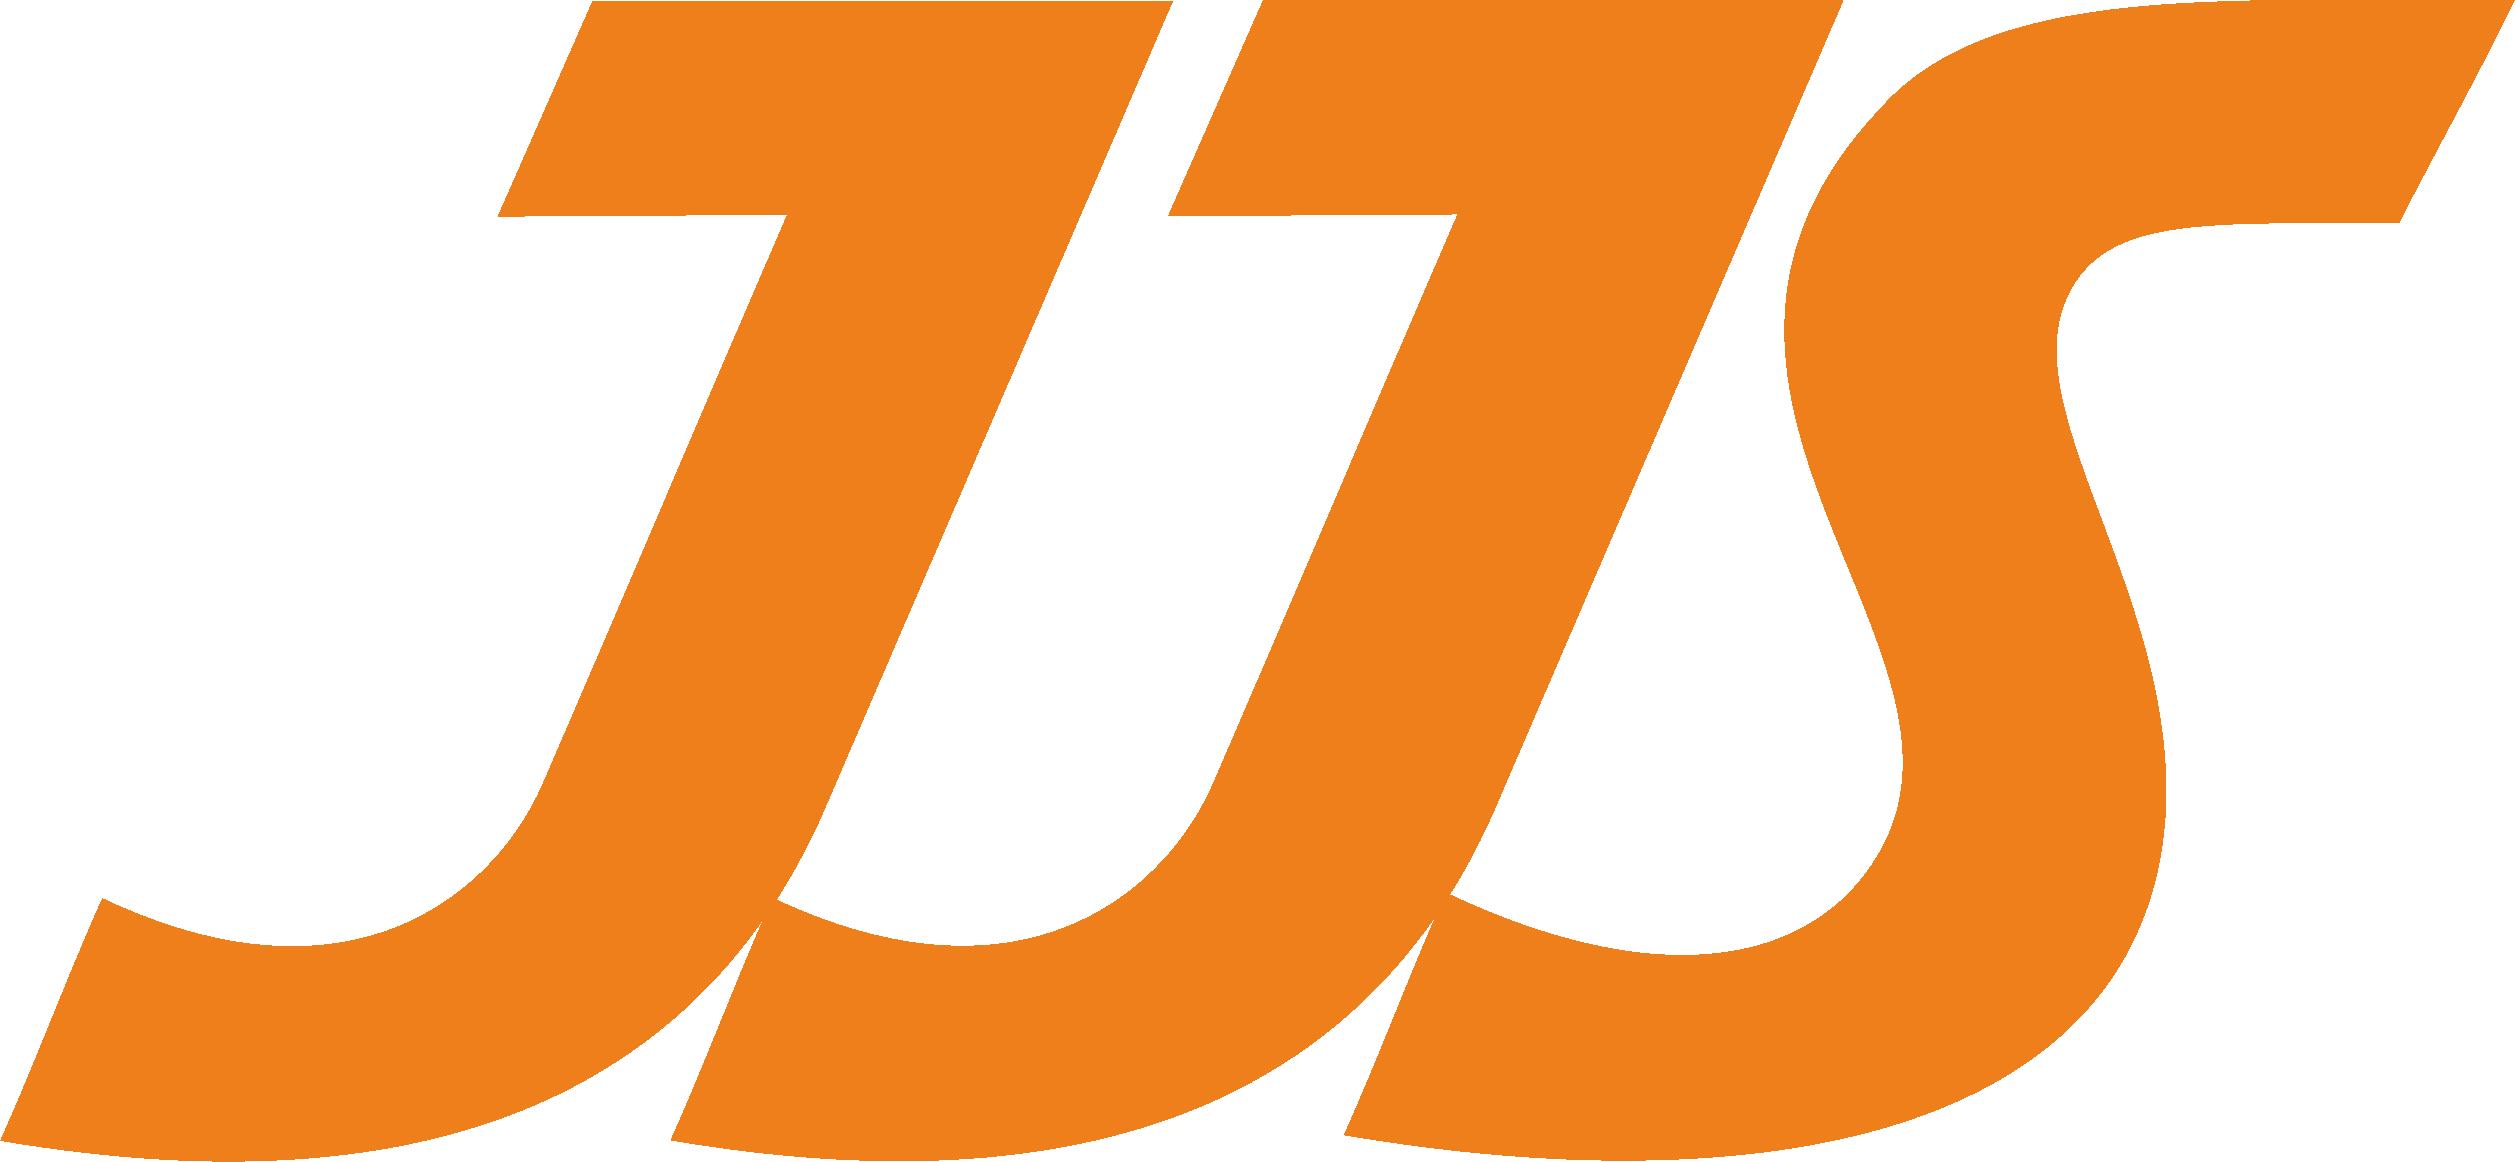 JJS_orange